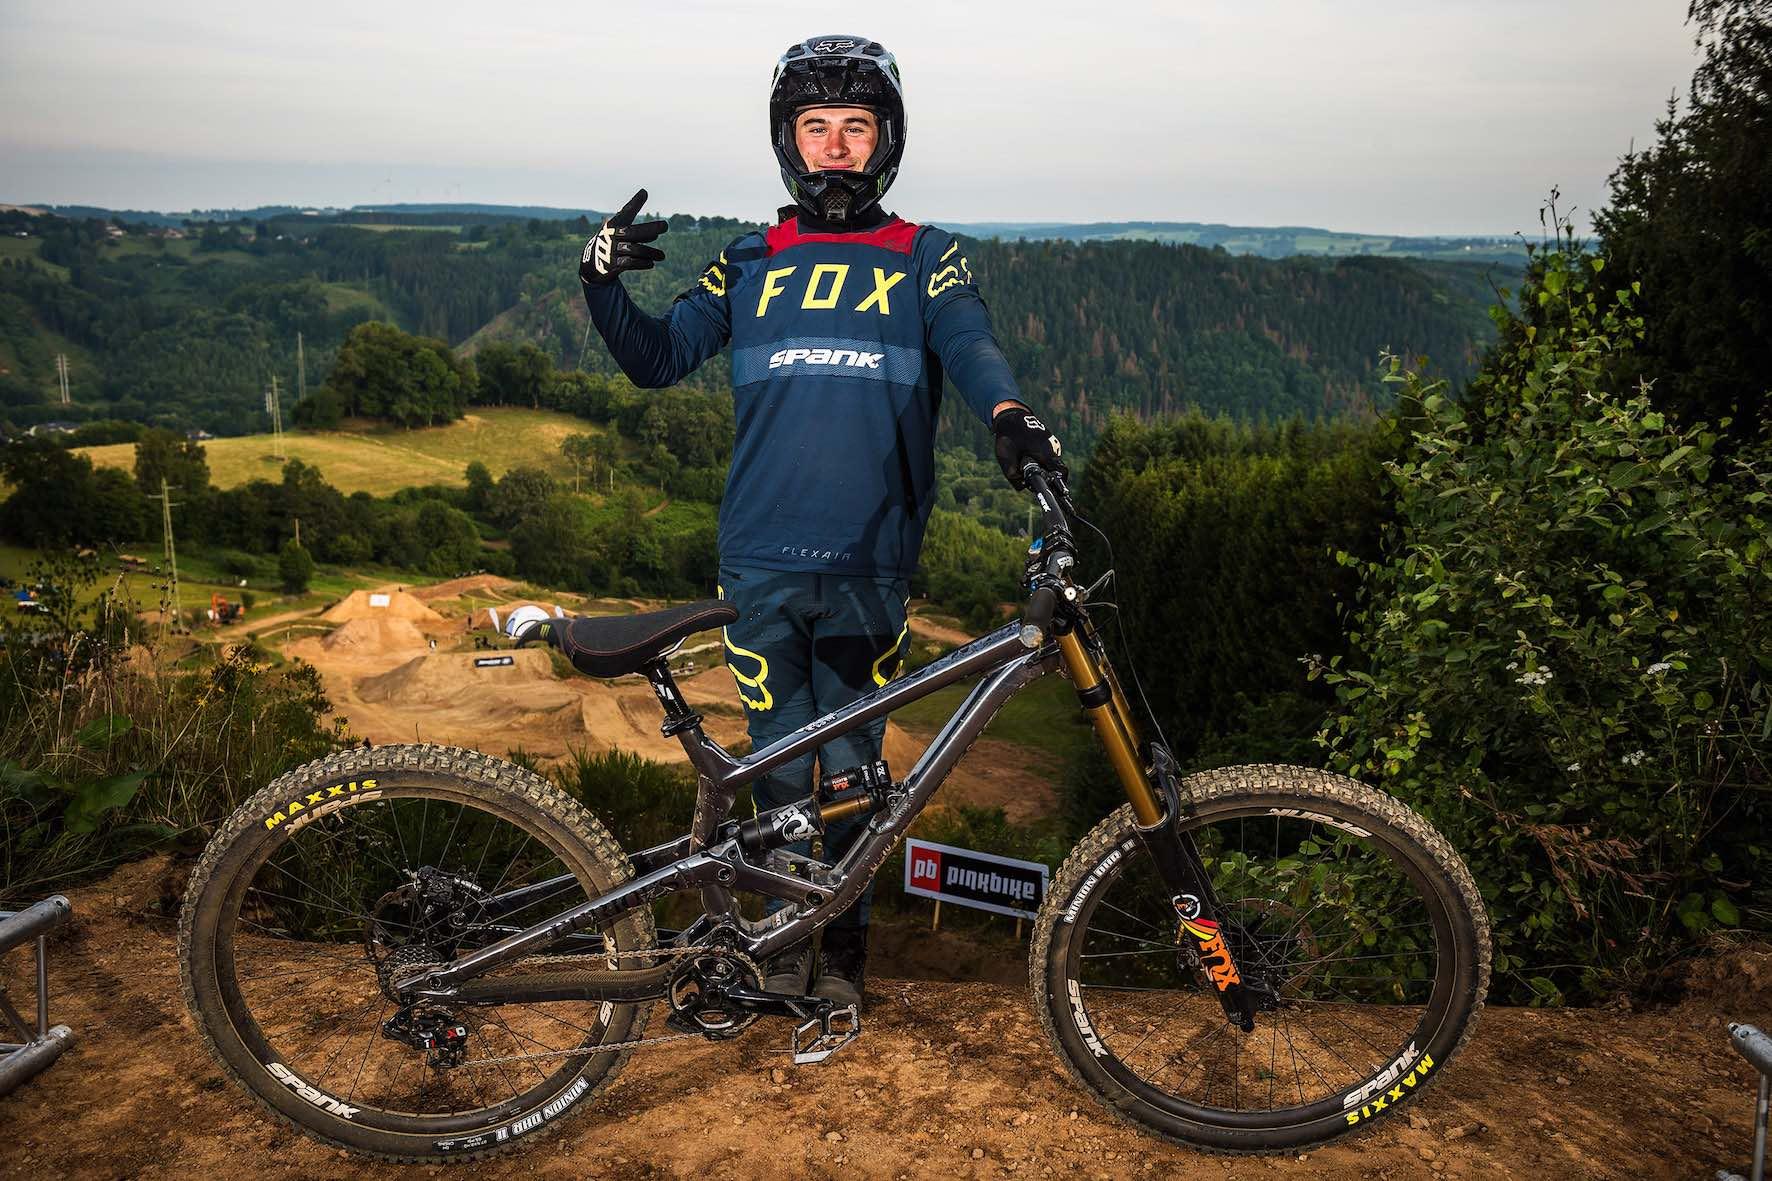 Bikes of Loosefest Xl 2019 - Theo Erlangsen on Commencal